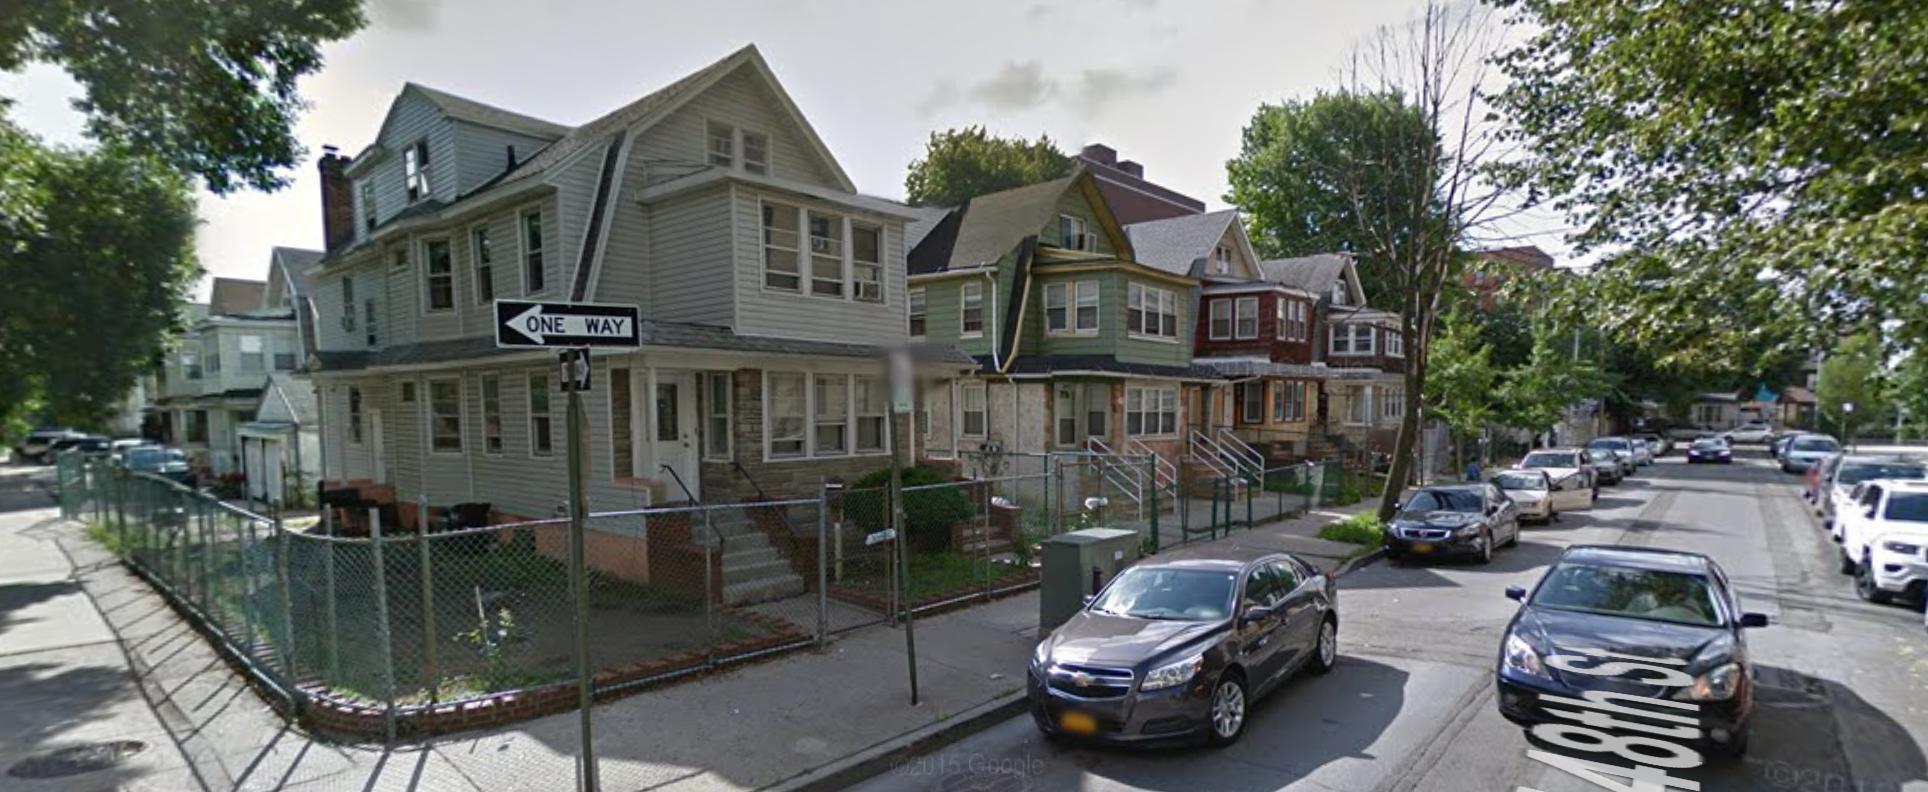 89-07 148th Street. image via Google Maps